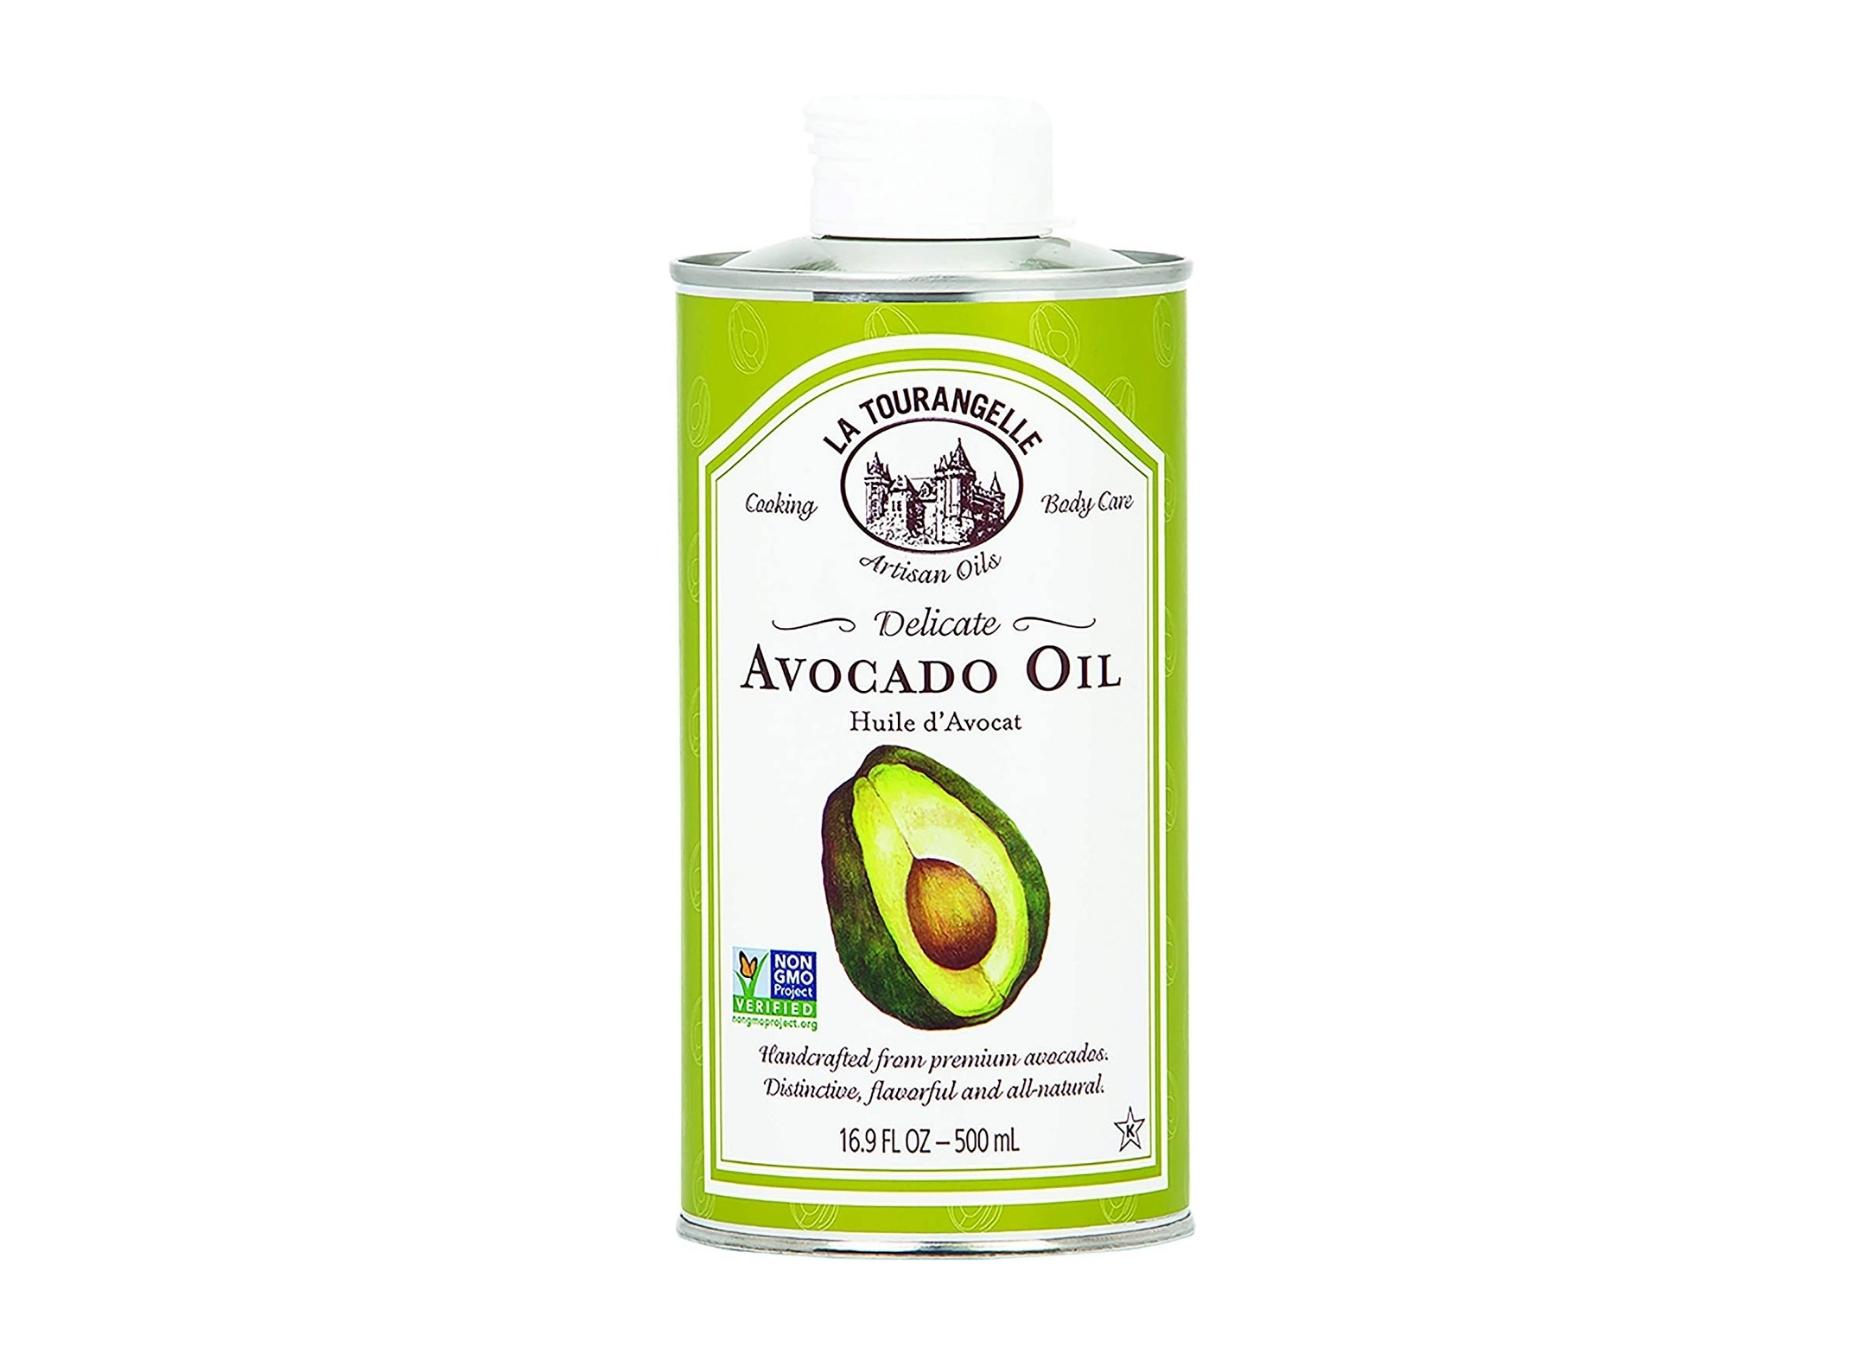 Latourangelle Avocado Oil